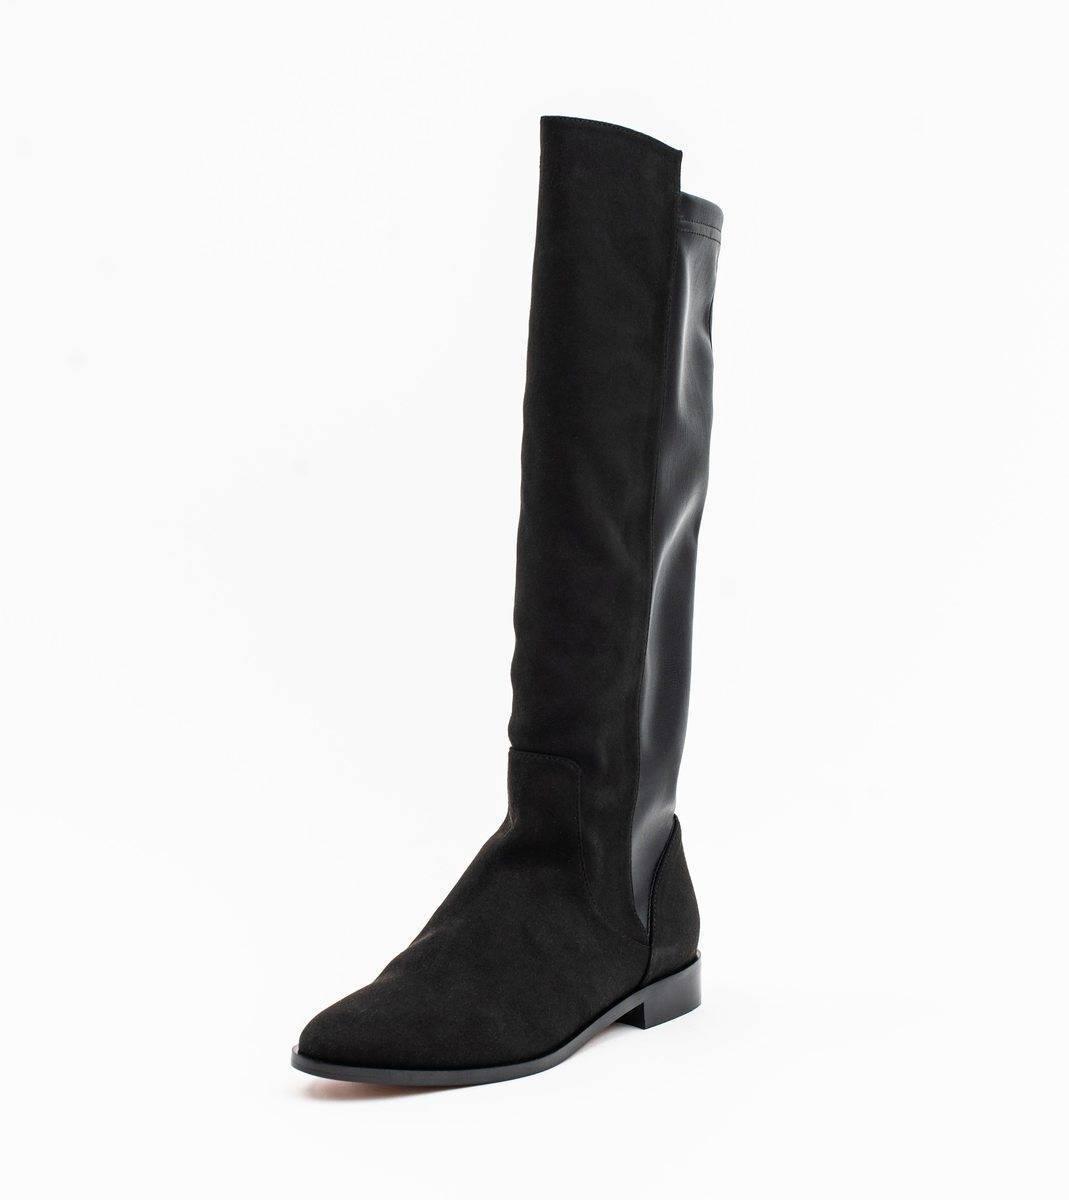 Allkind Grace Black Two Tone Vegan Long Flat Boot